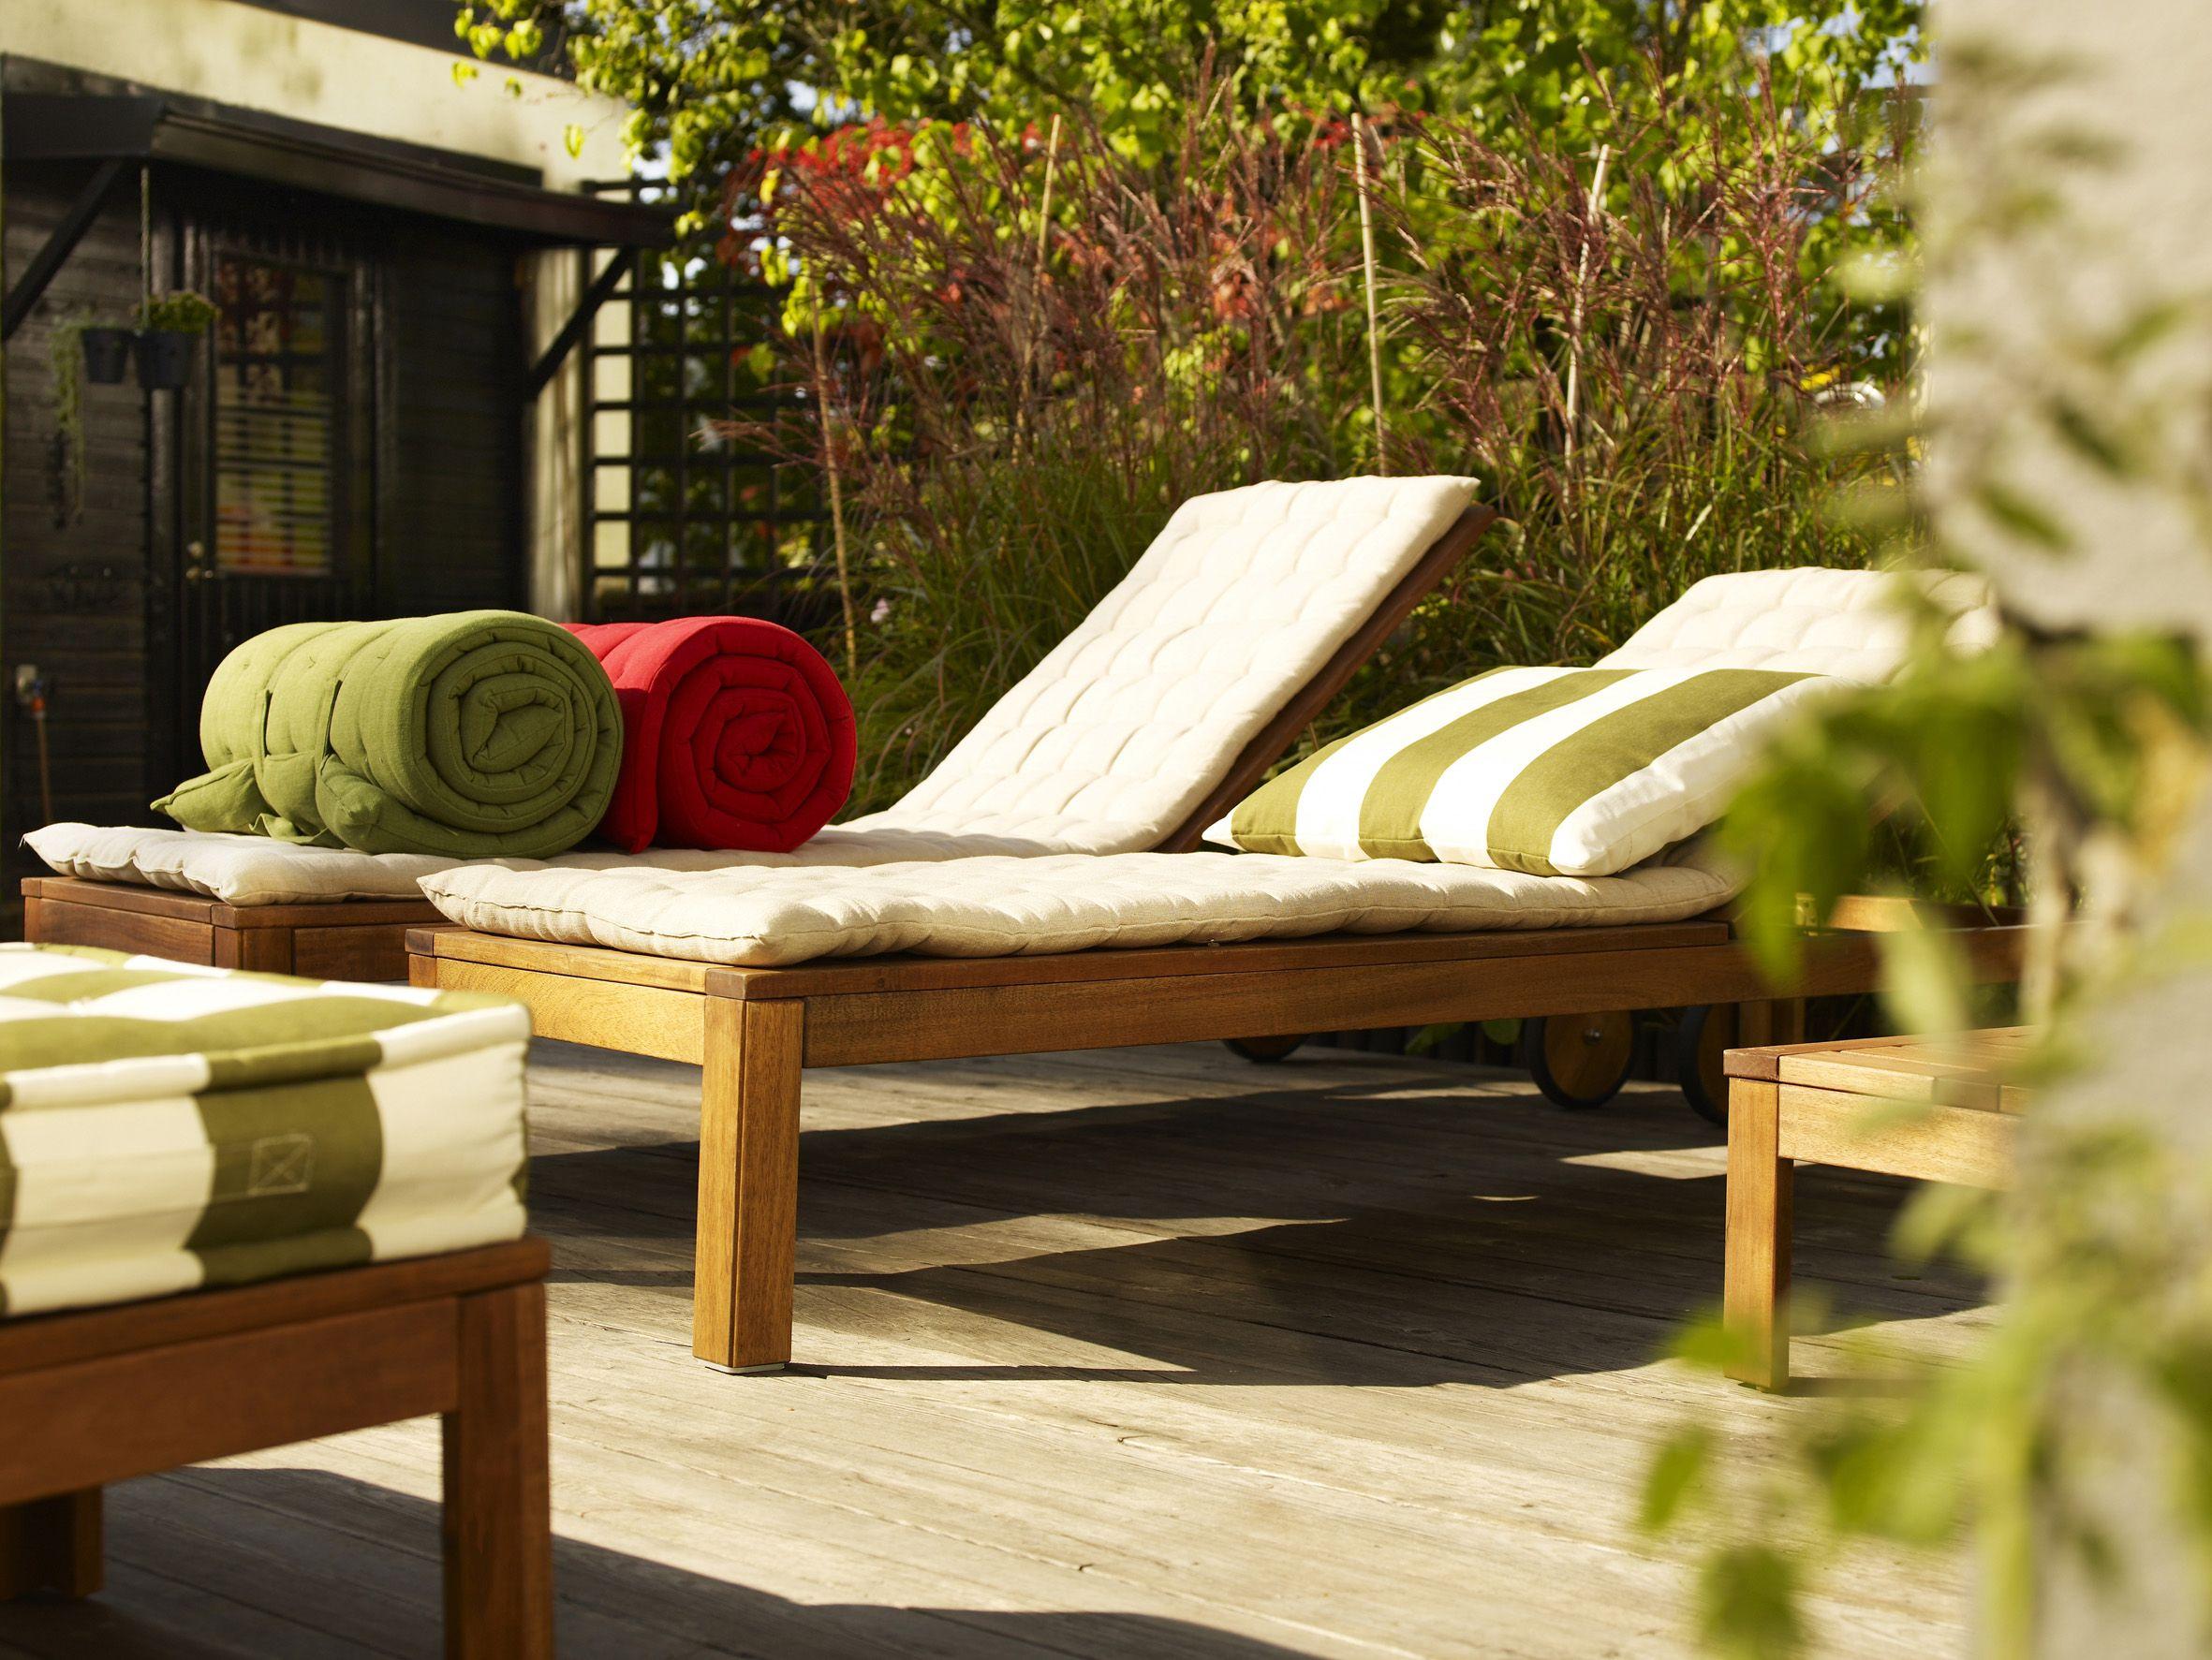 Full Size of Gartenliege Holz Ikea Sonnenliege Gartenliegen Pplar Fenster Alu Schlafzimmer Massivholz Vollholzküche Esstische Garten Holzhaus Spielhaus Betten Bett 180x200 Wohnzimmer Gartenliege Holz Ikea